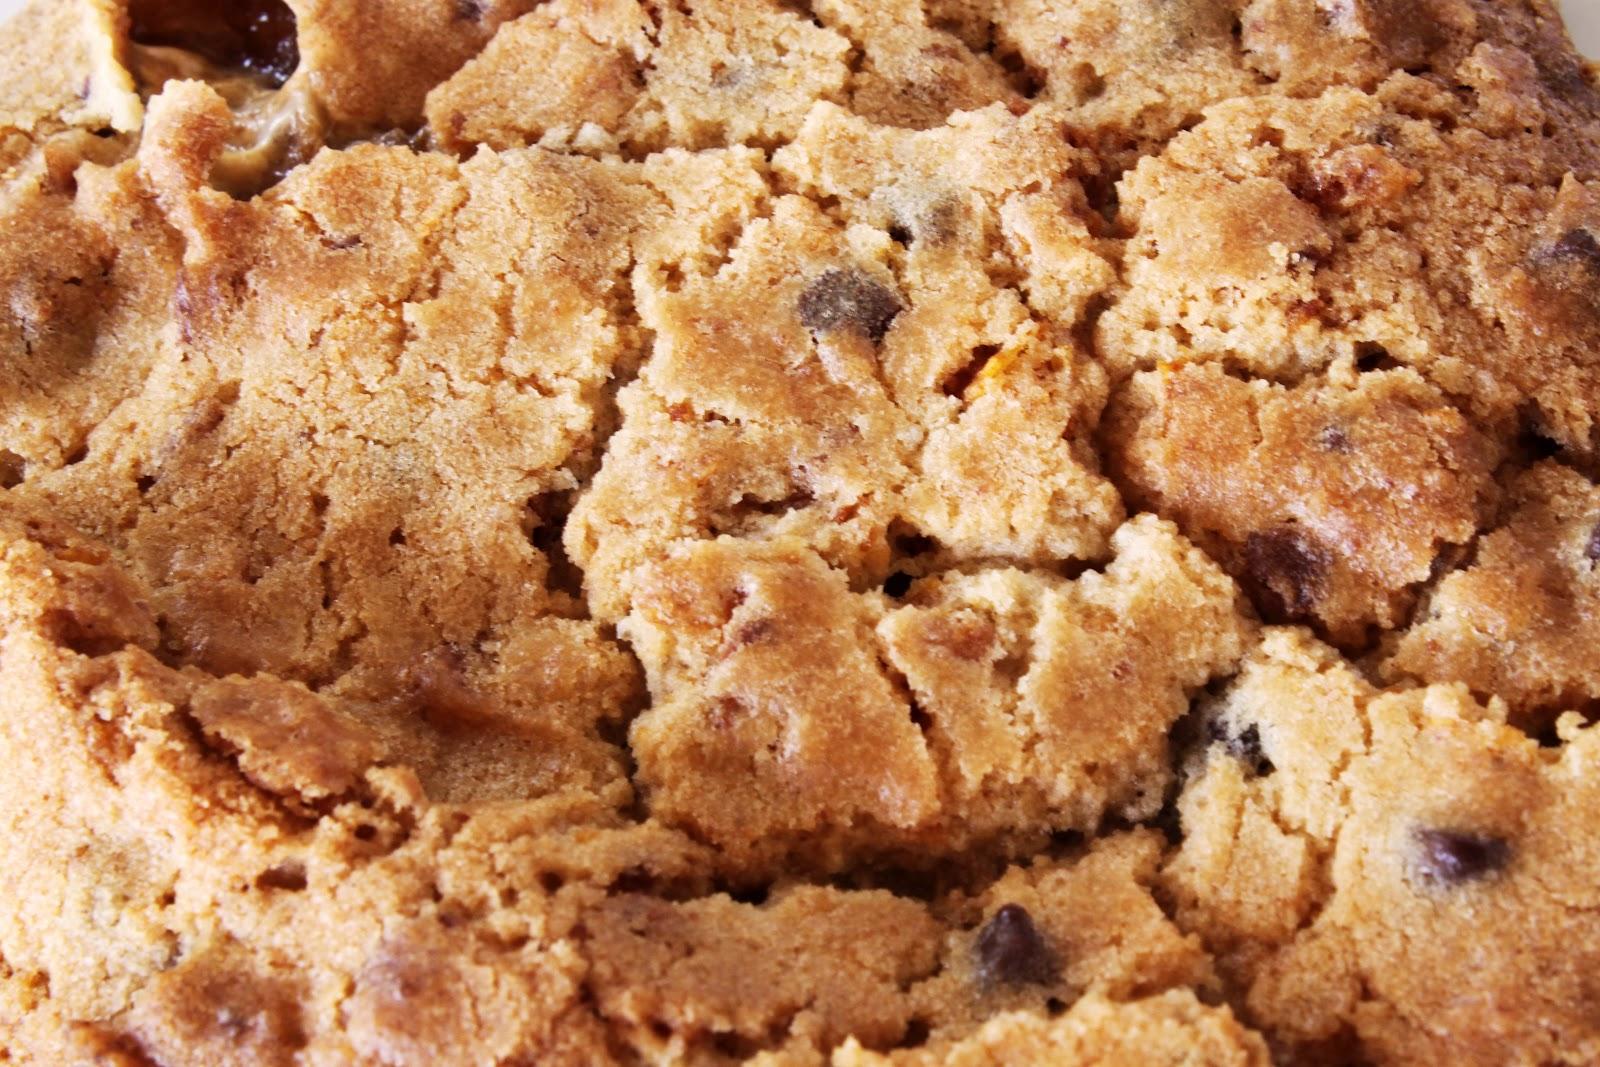 ... Kitchen: Momofuku's cornflake-chocolate-chip-marshmallow cookies